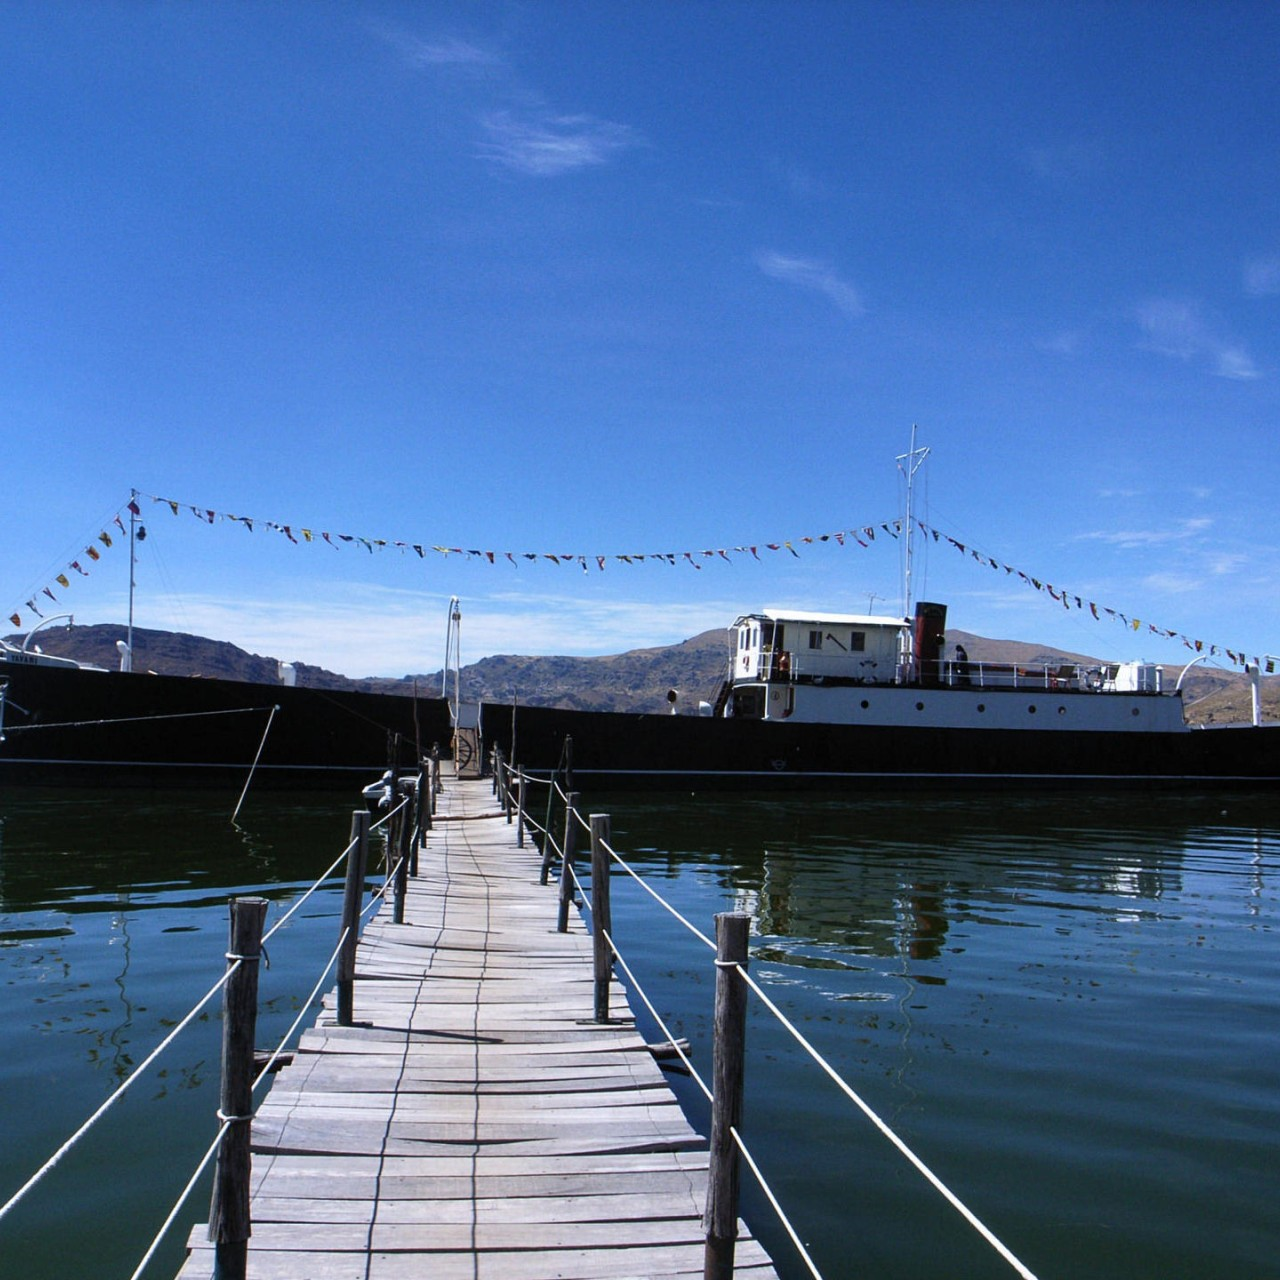 Hot spots: The Yavari, Lake Titicaca | South China Morning Post